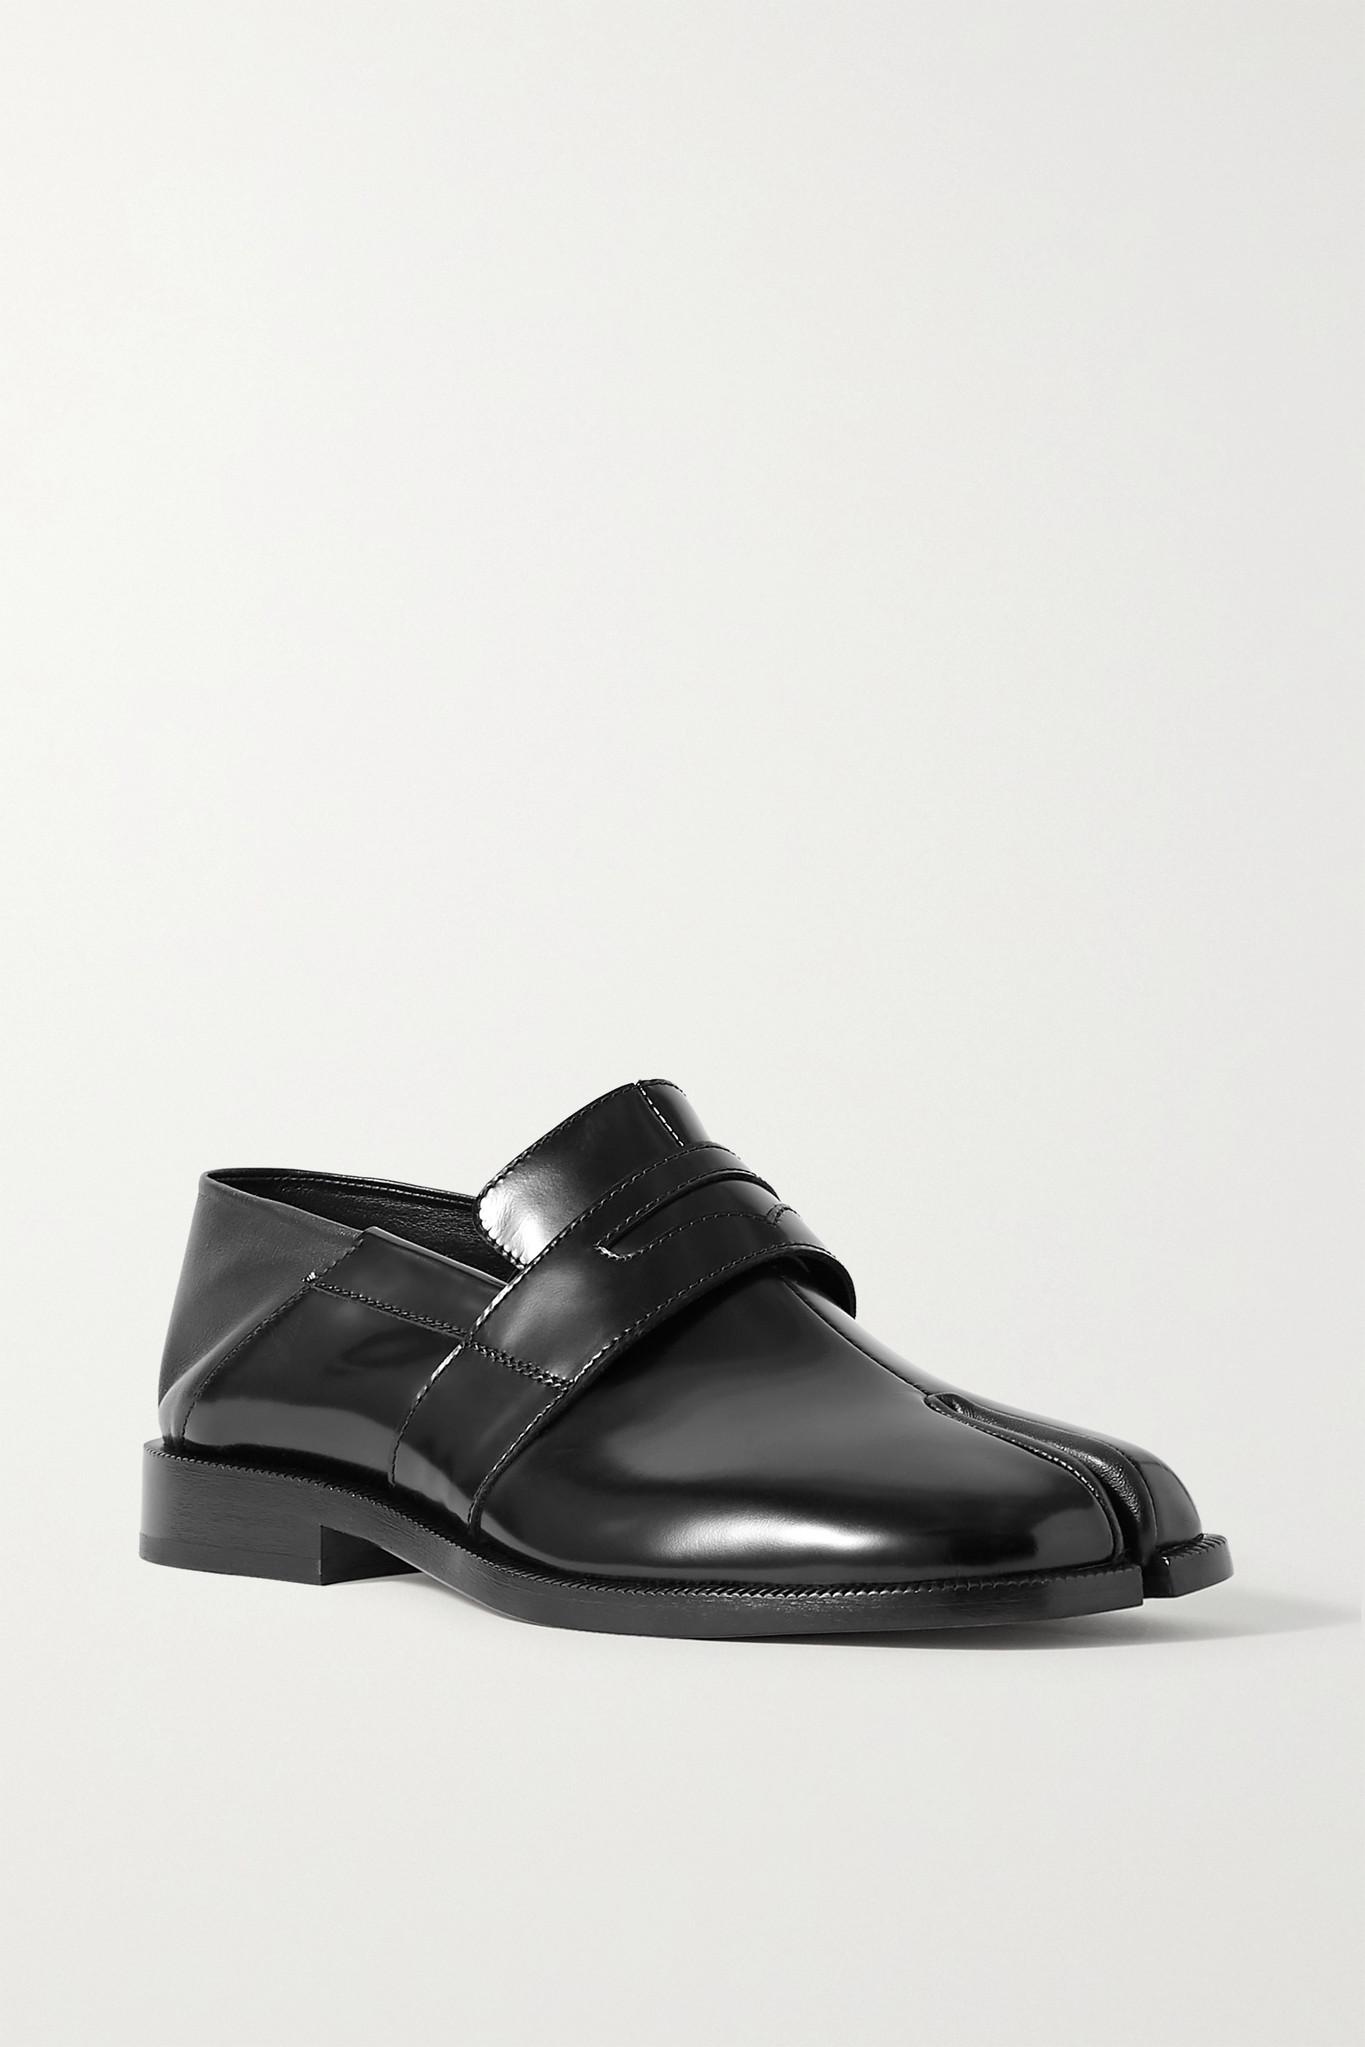 MAISON MARGIELA - 分趾漆皮折叠式后跟乐福鞋 - 黑色 - IT36